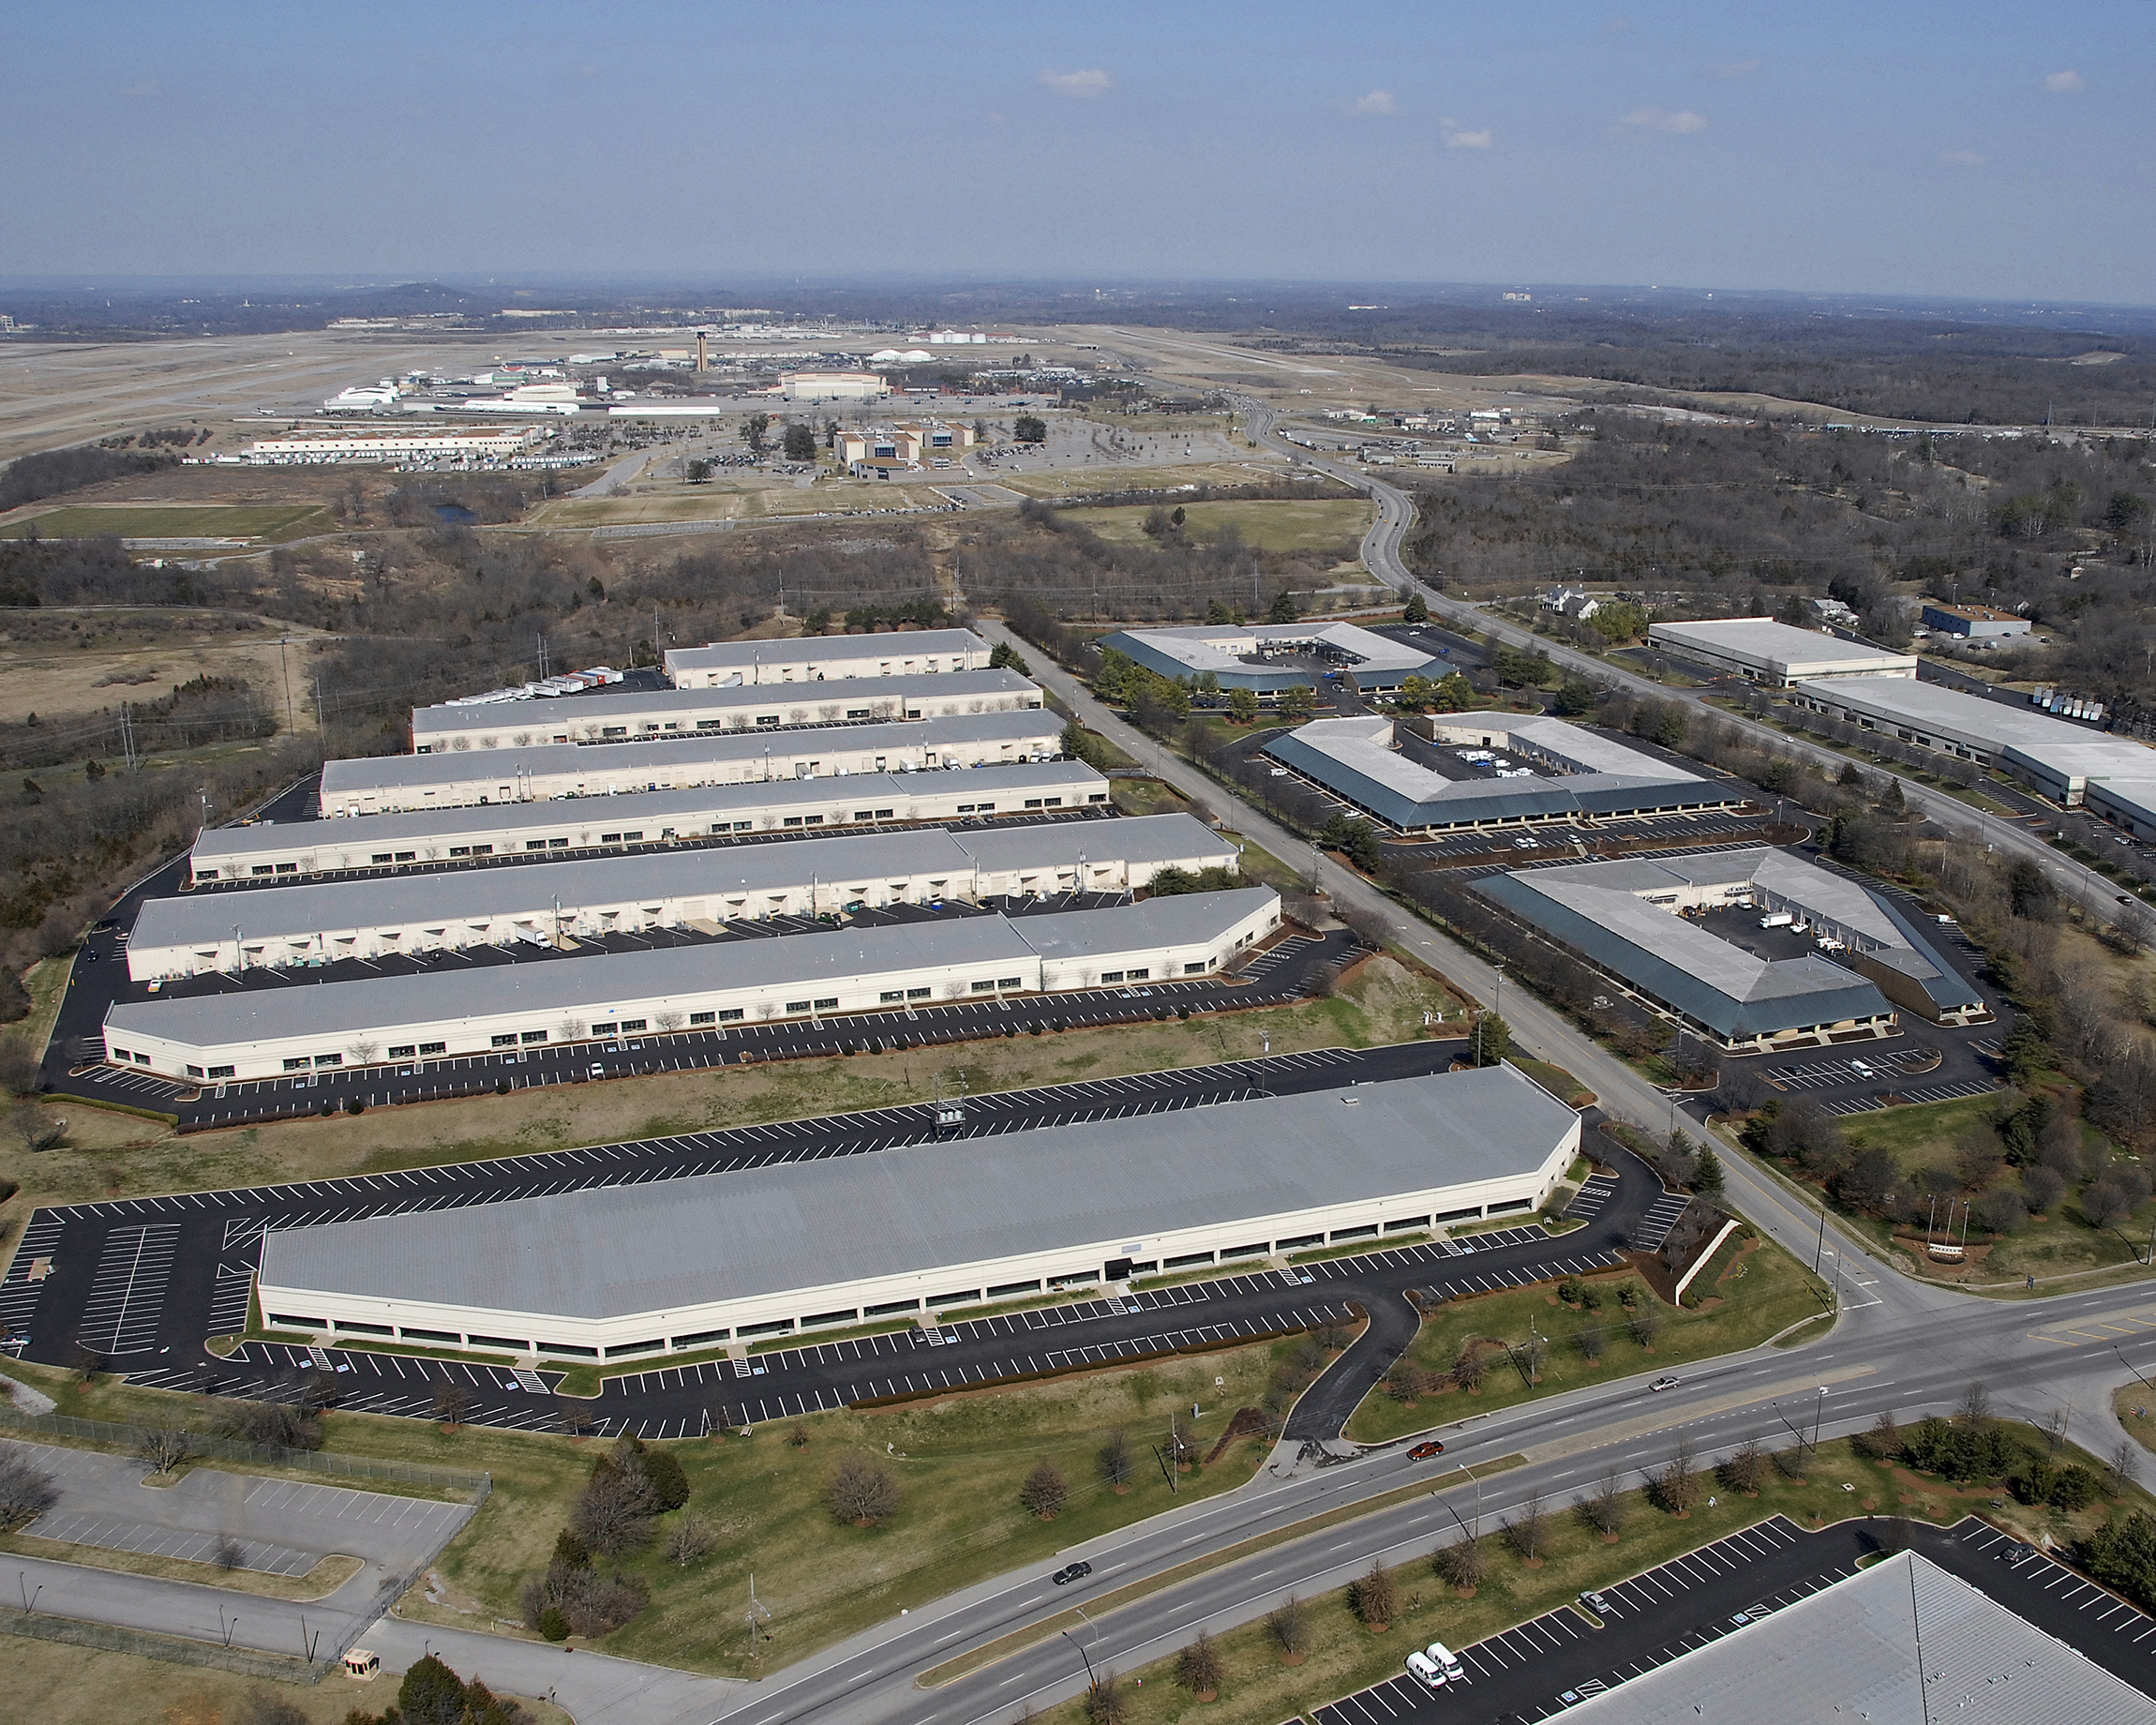 Aerial photos 002.jpg